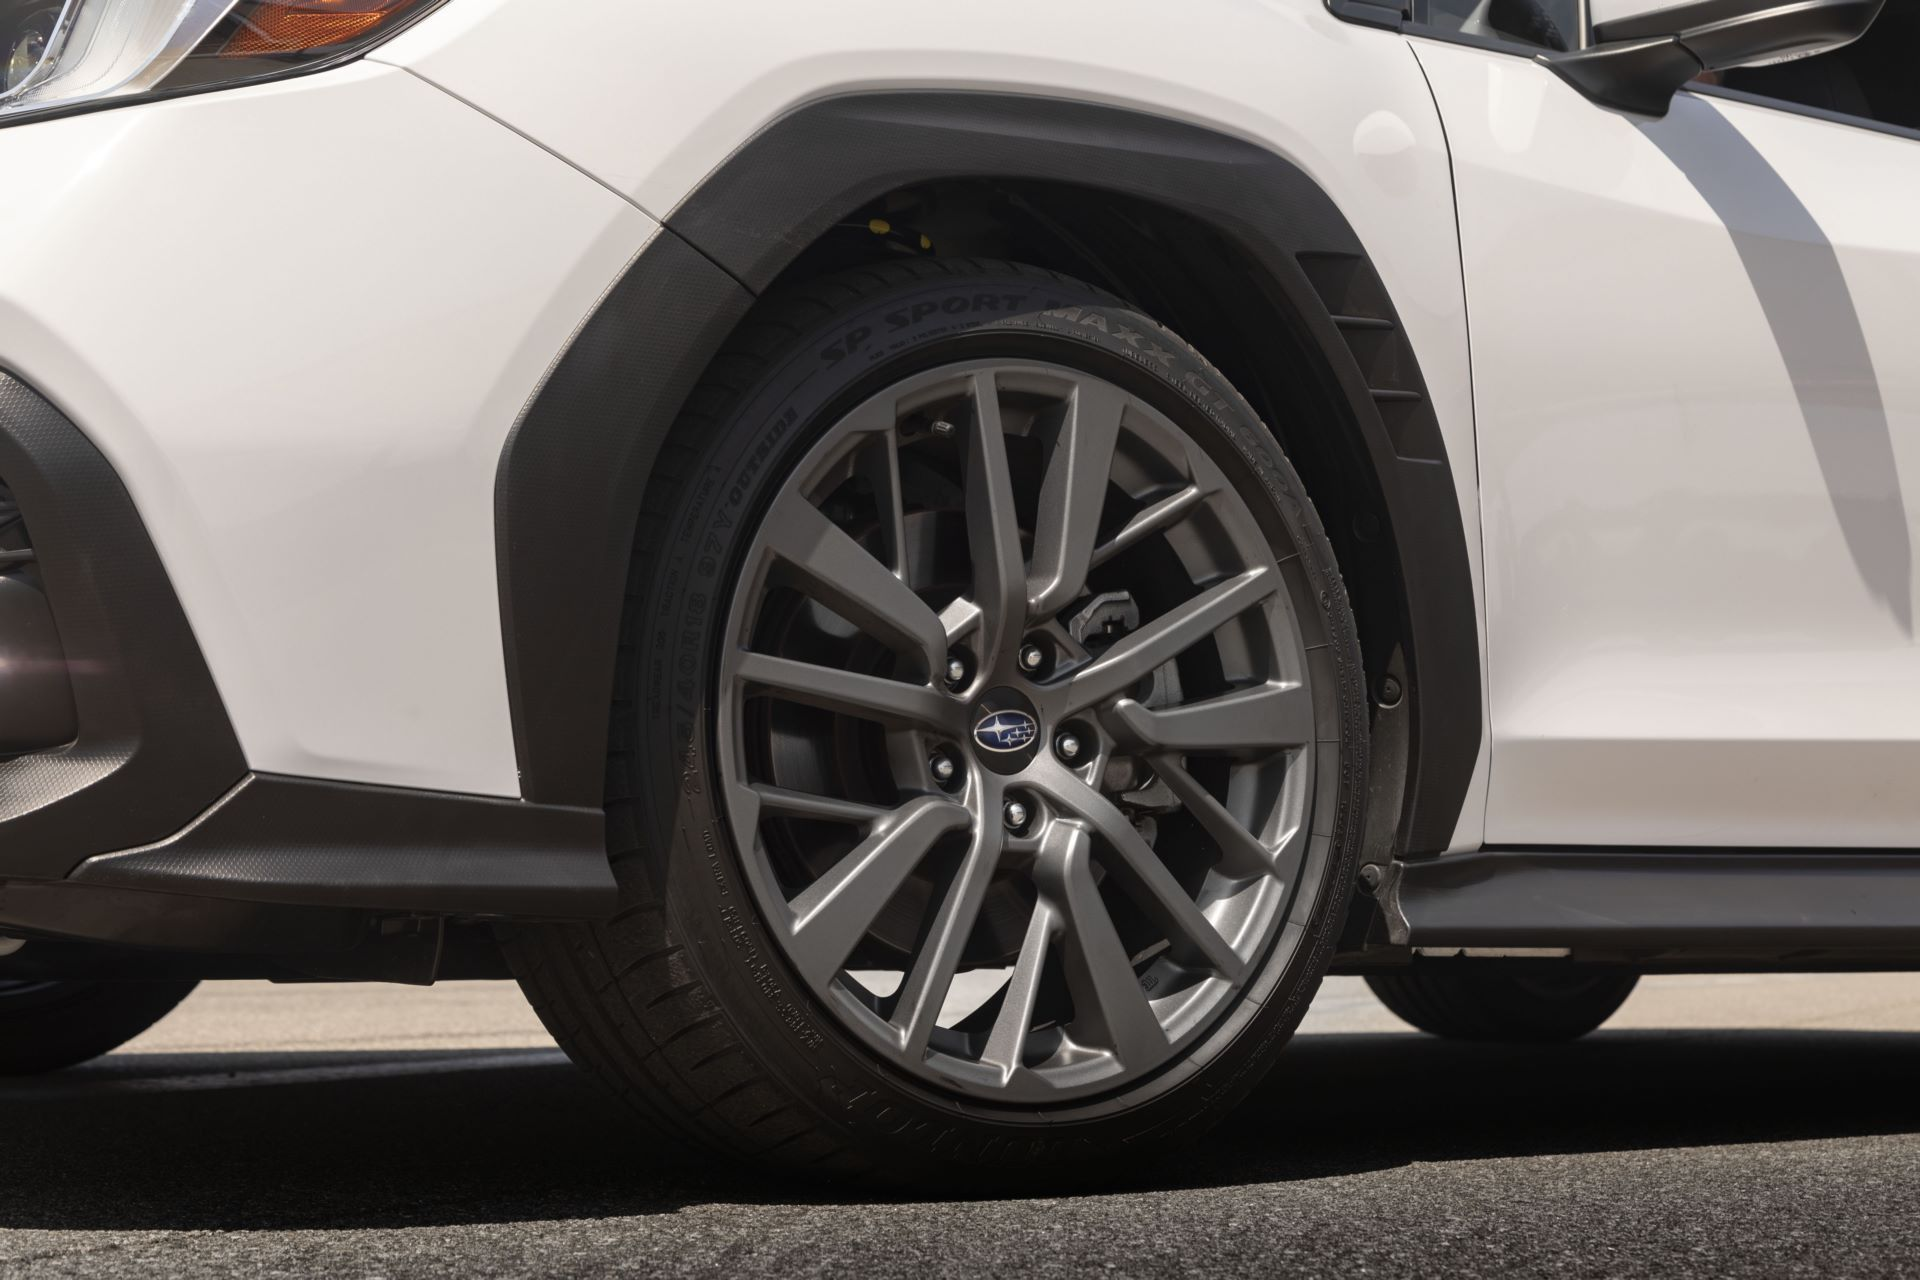 Subaru-WRX-2022-31